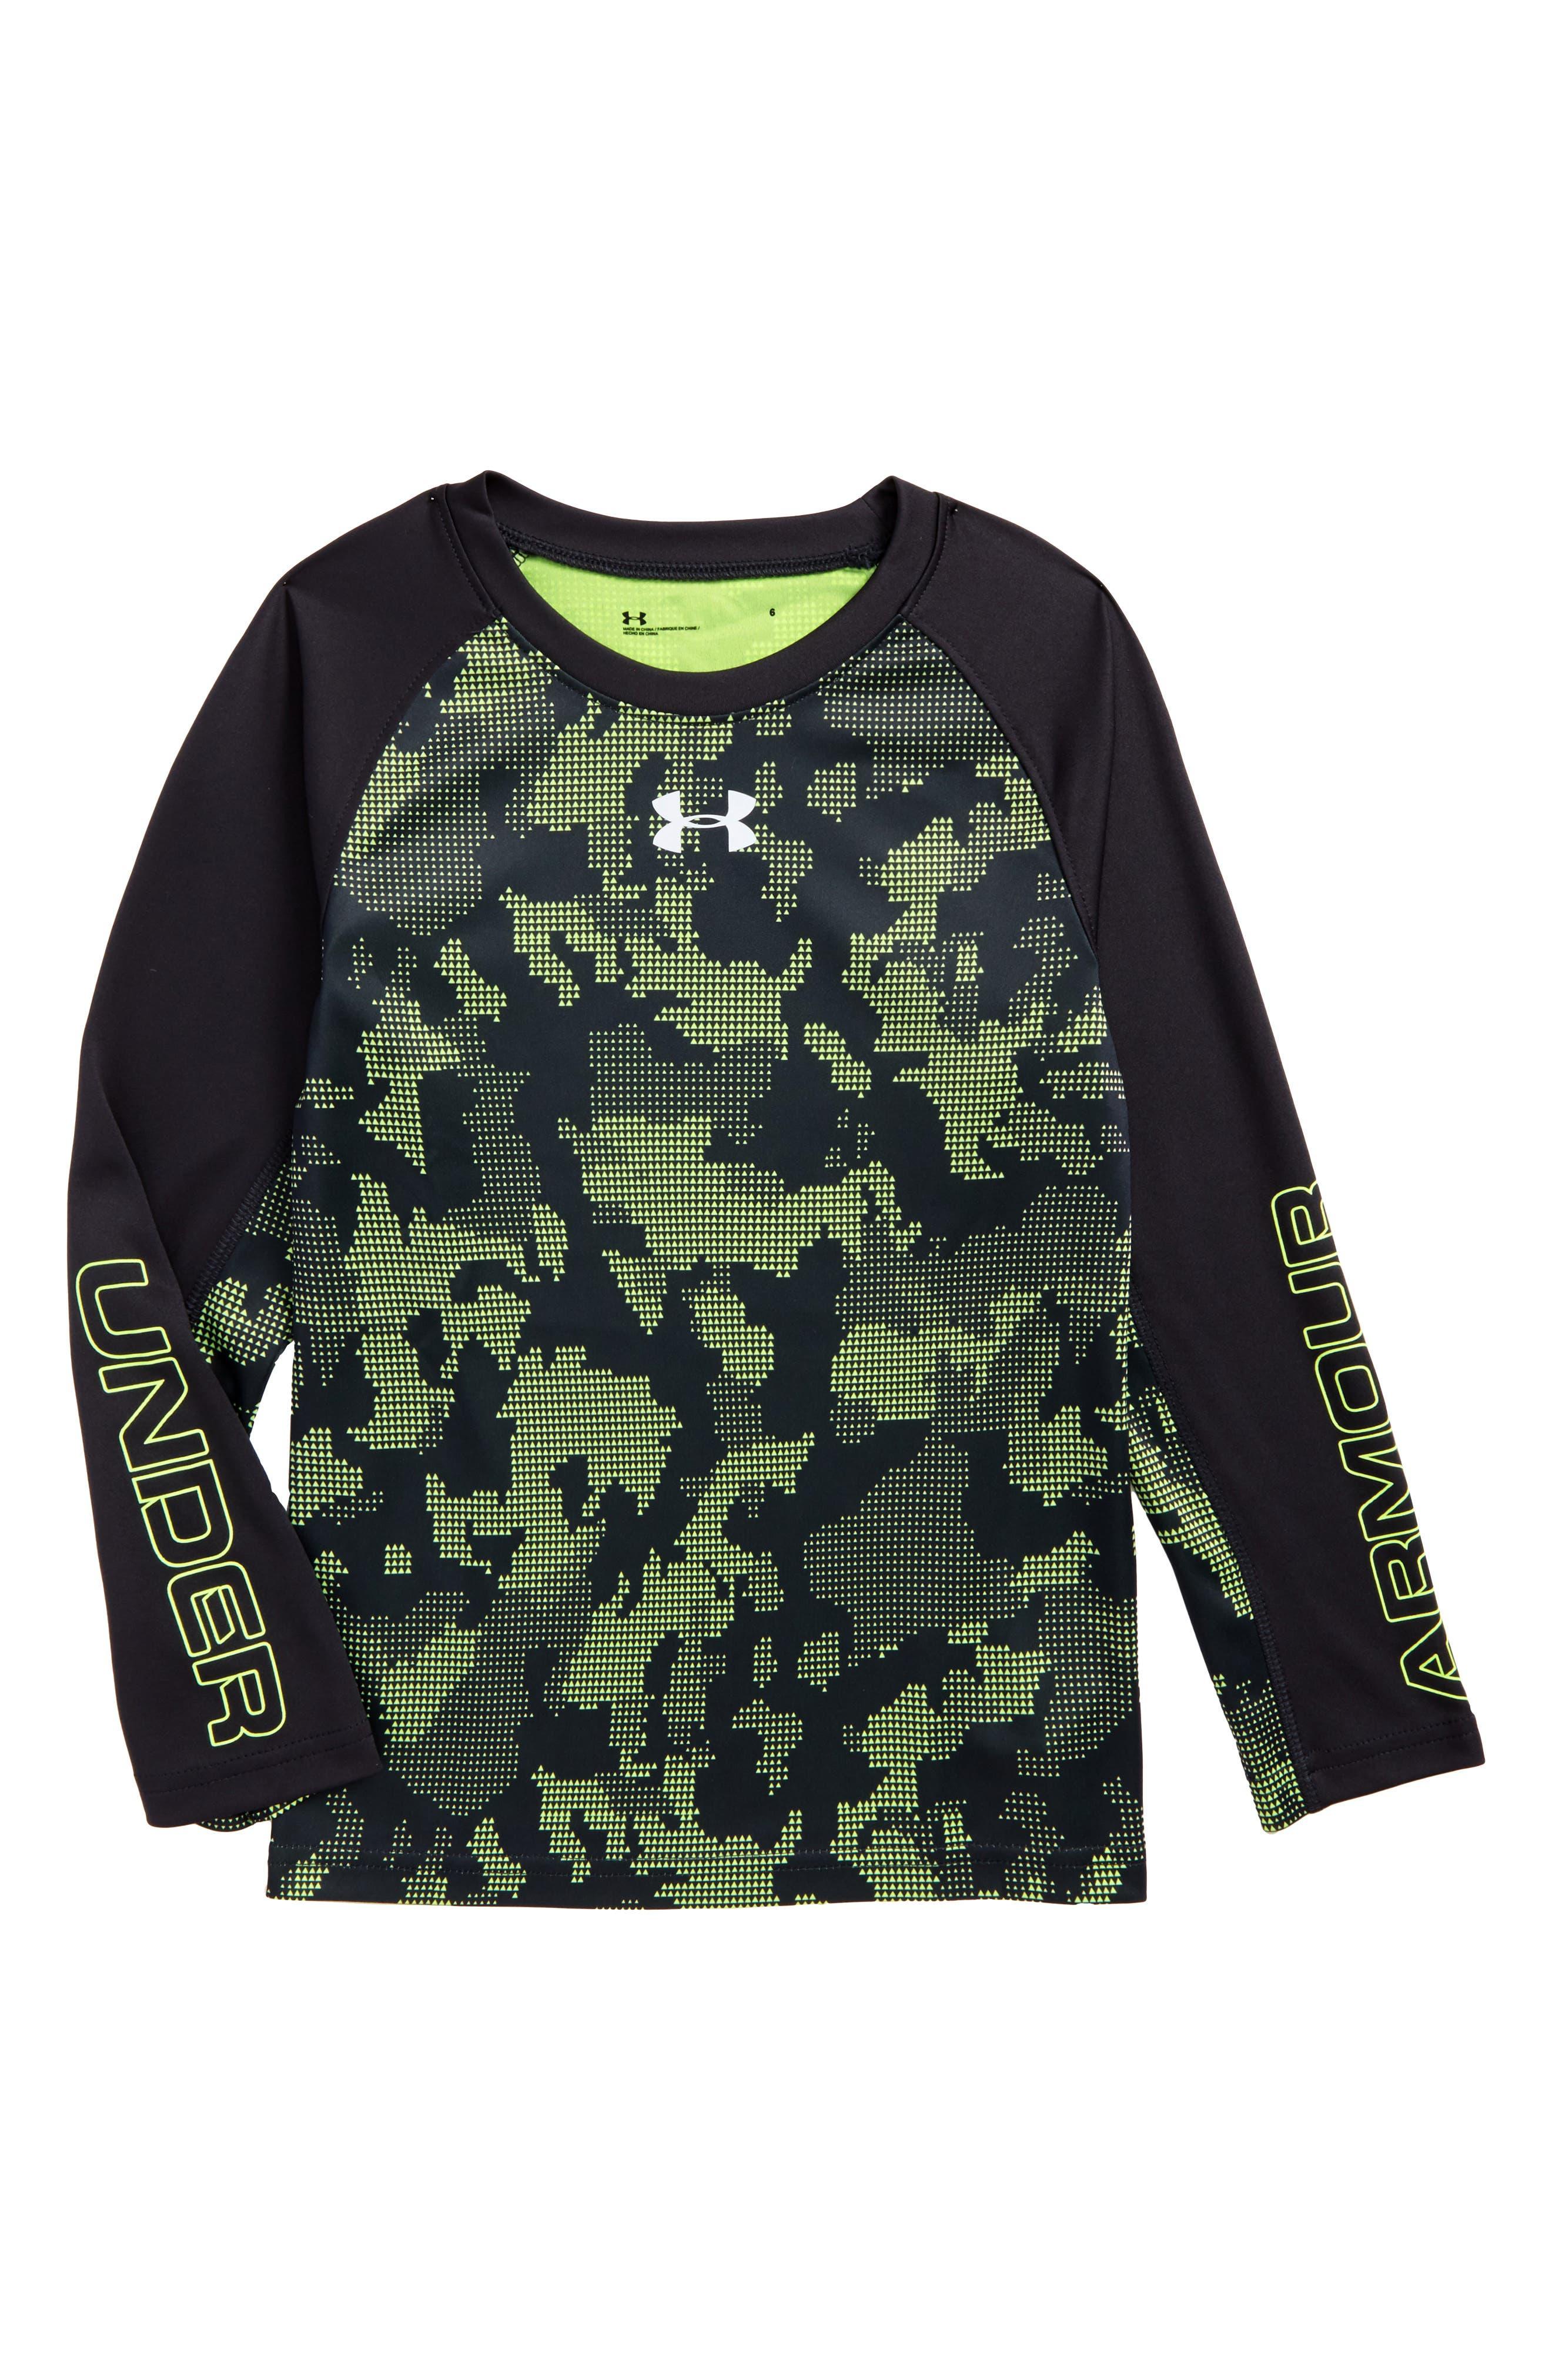 Alternate Image 1 Selected - Under Armour Utility Raglan Long Sleeve T-Shirt (Toddler Boys & Little Boys)